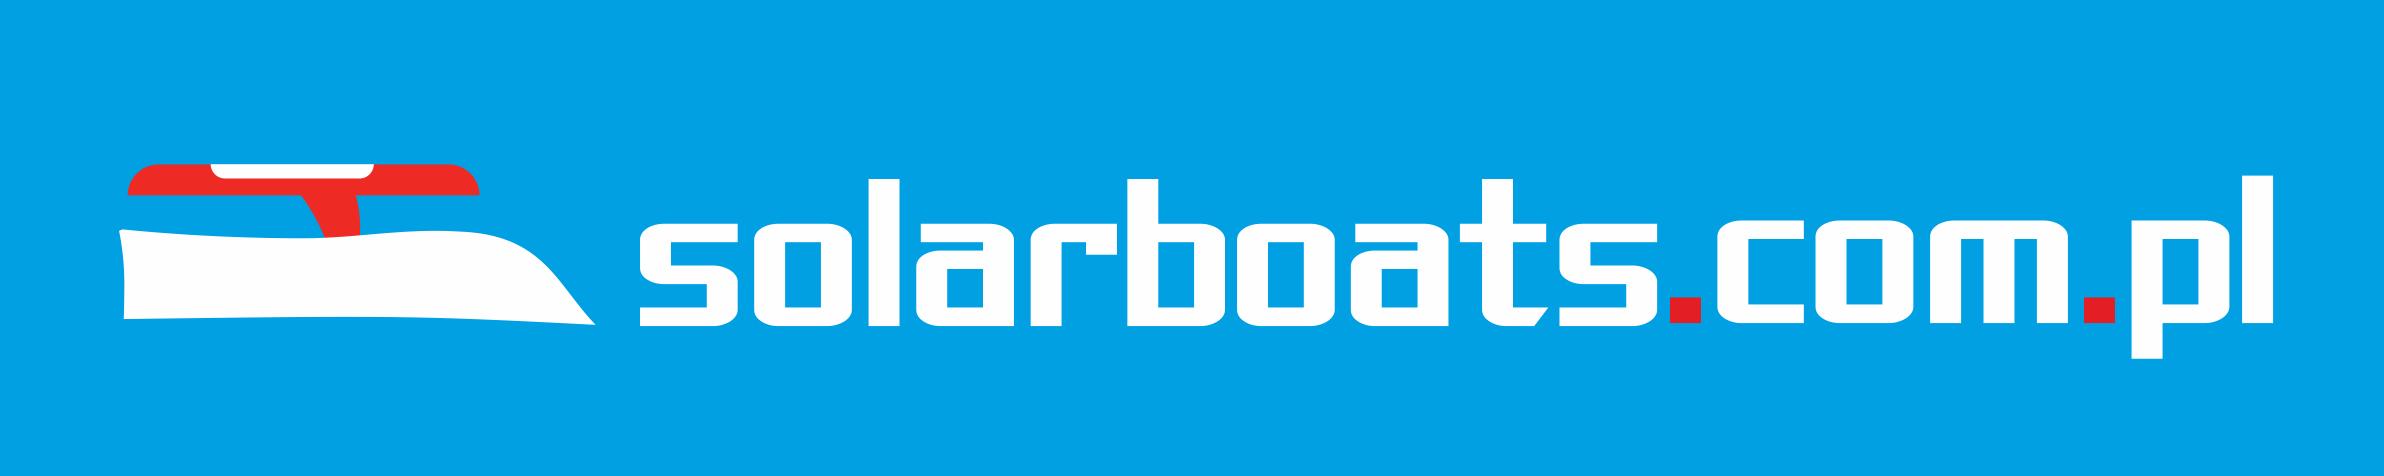 solarboats - logo